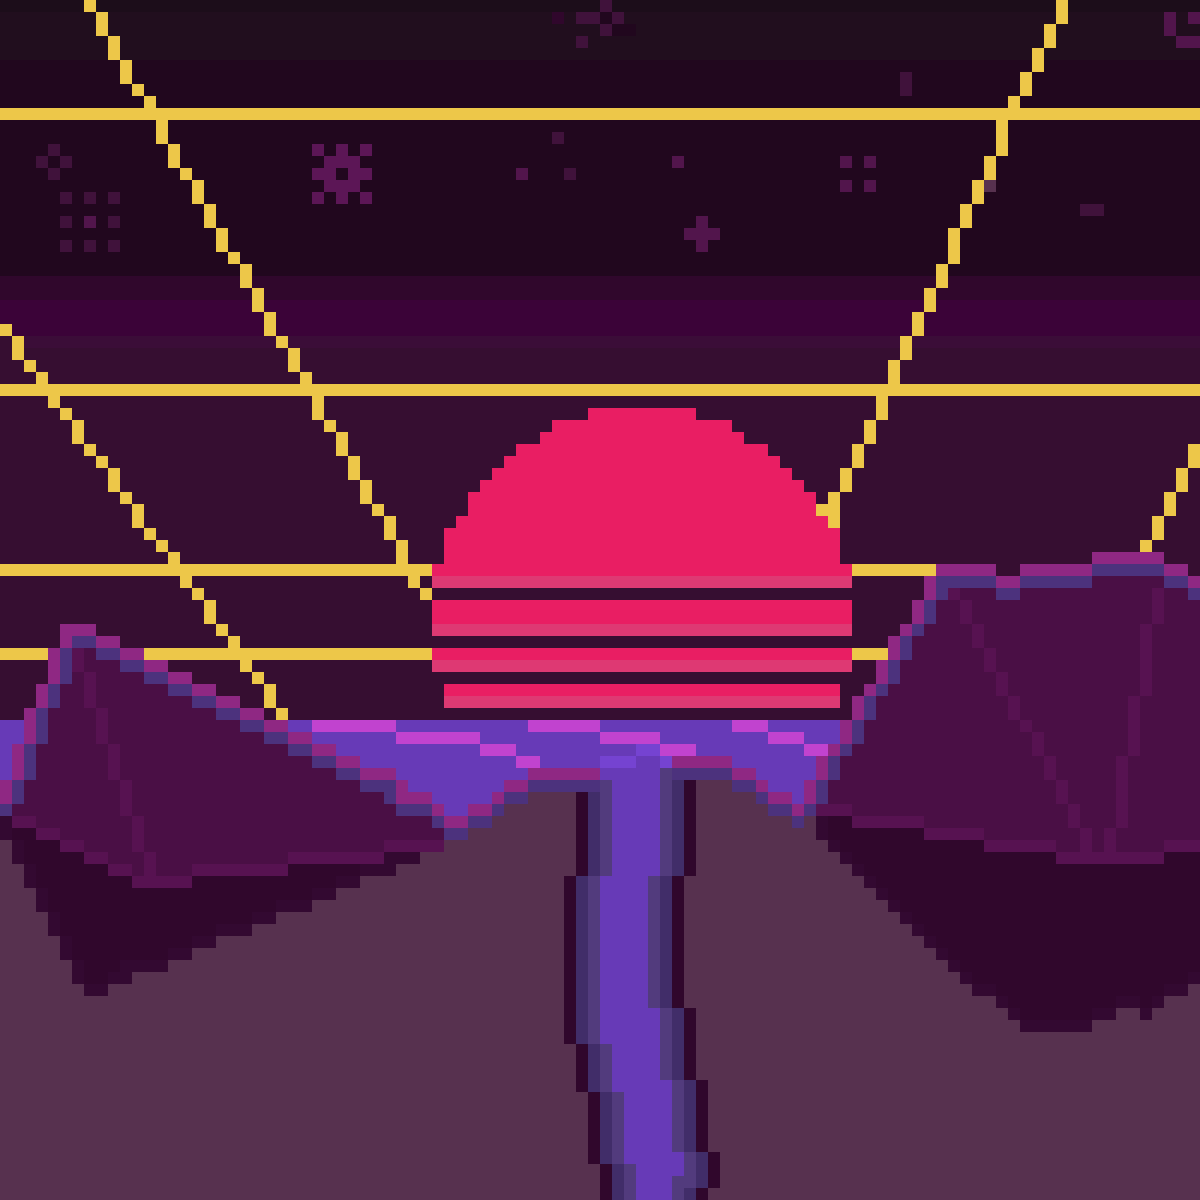 '80 Neon Bitset